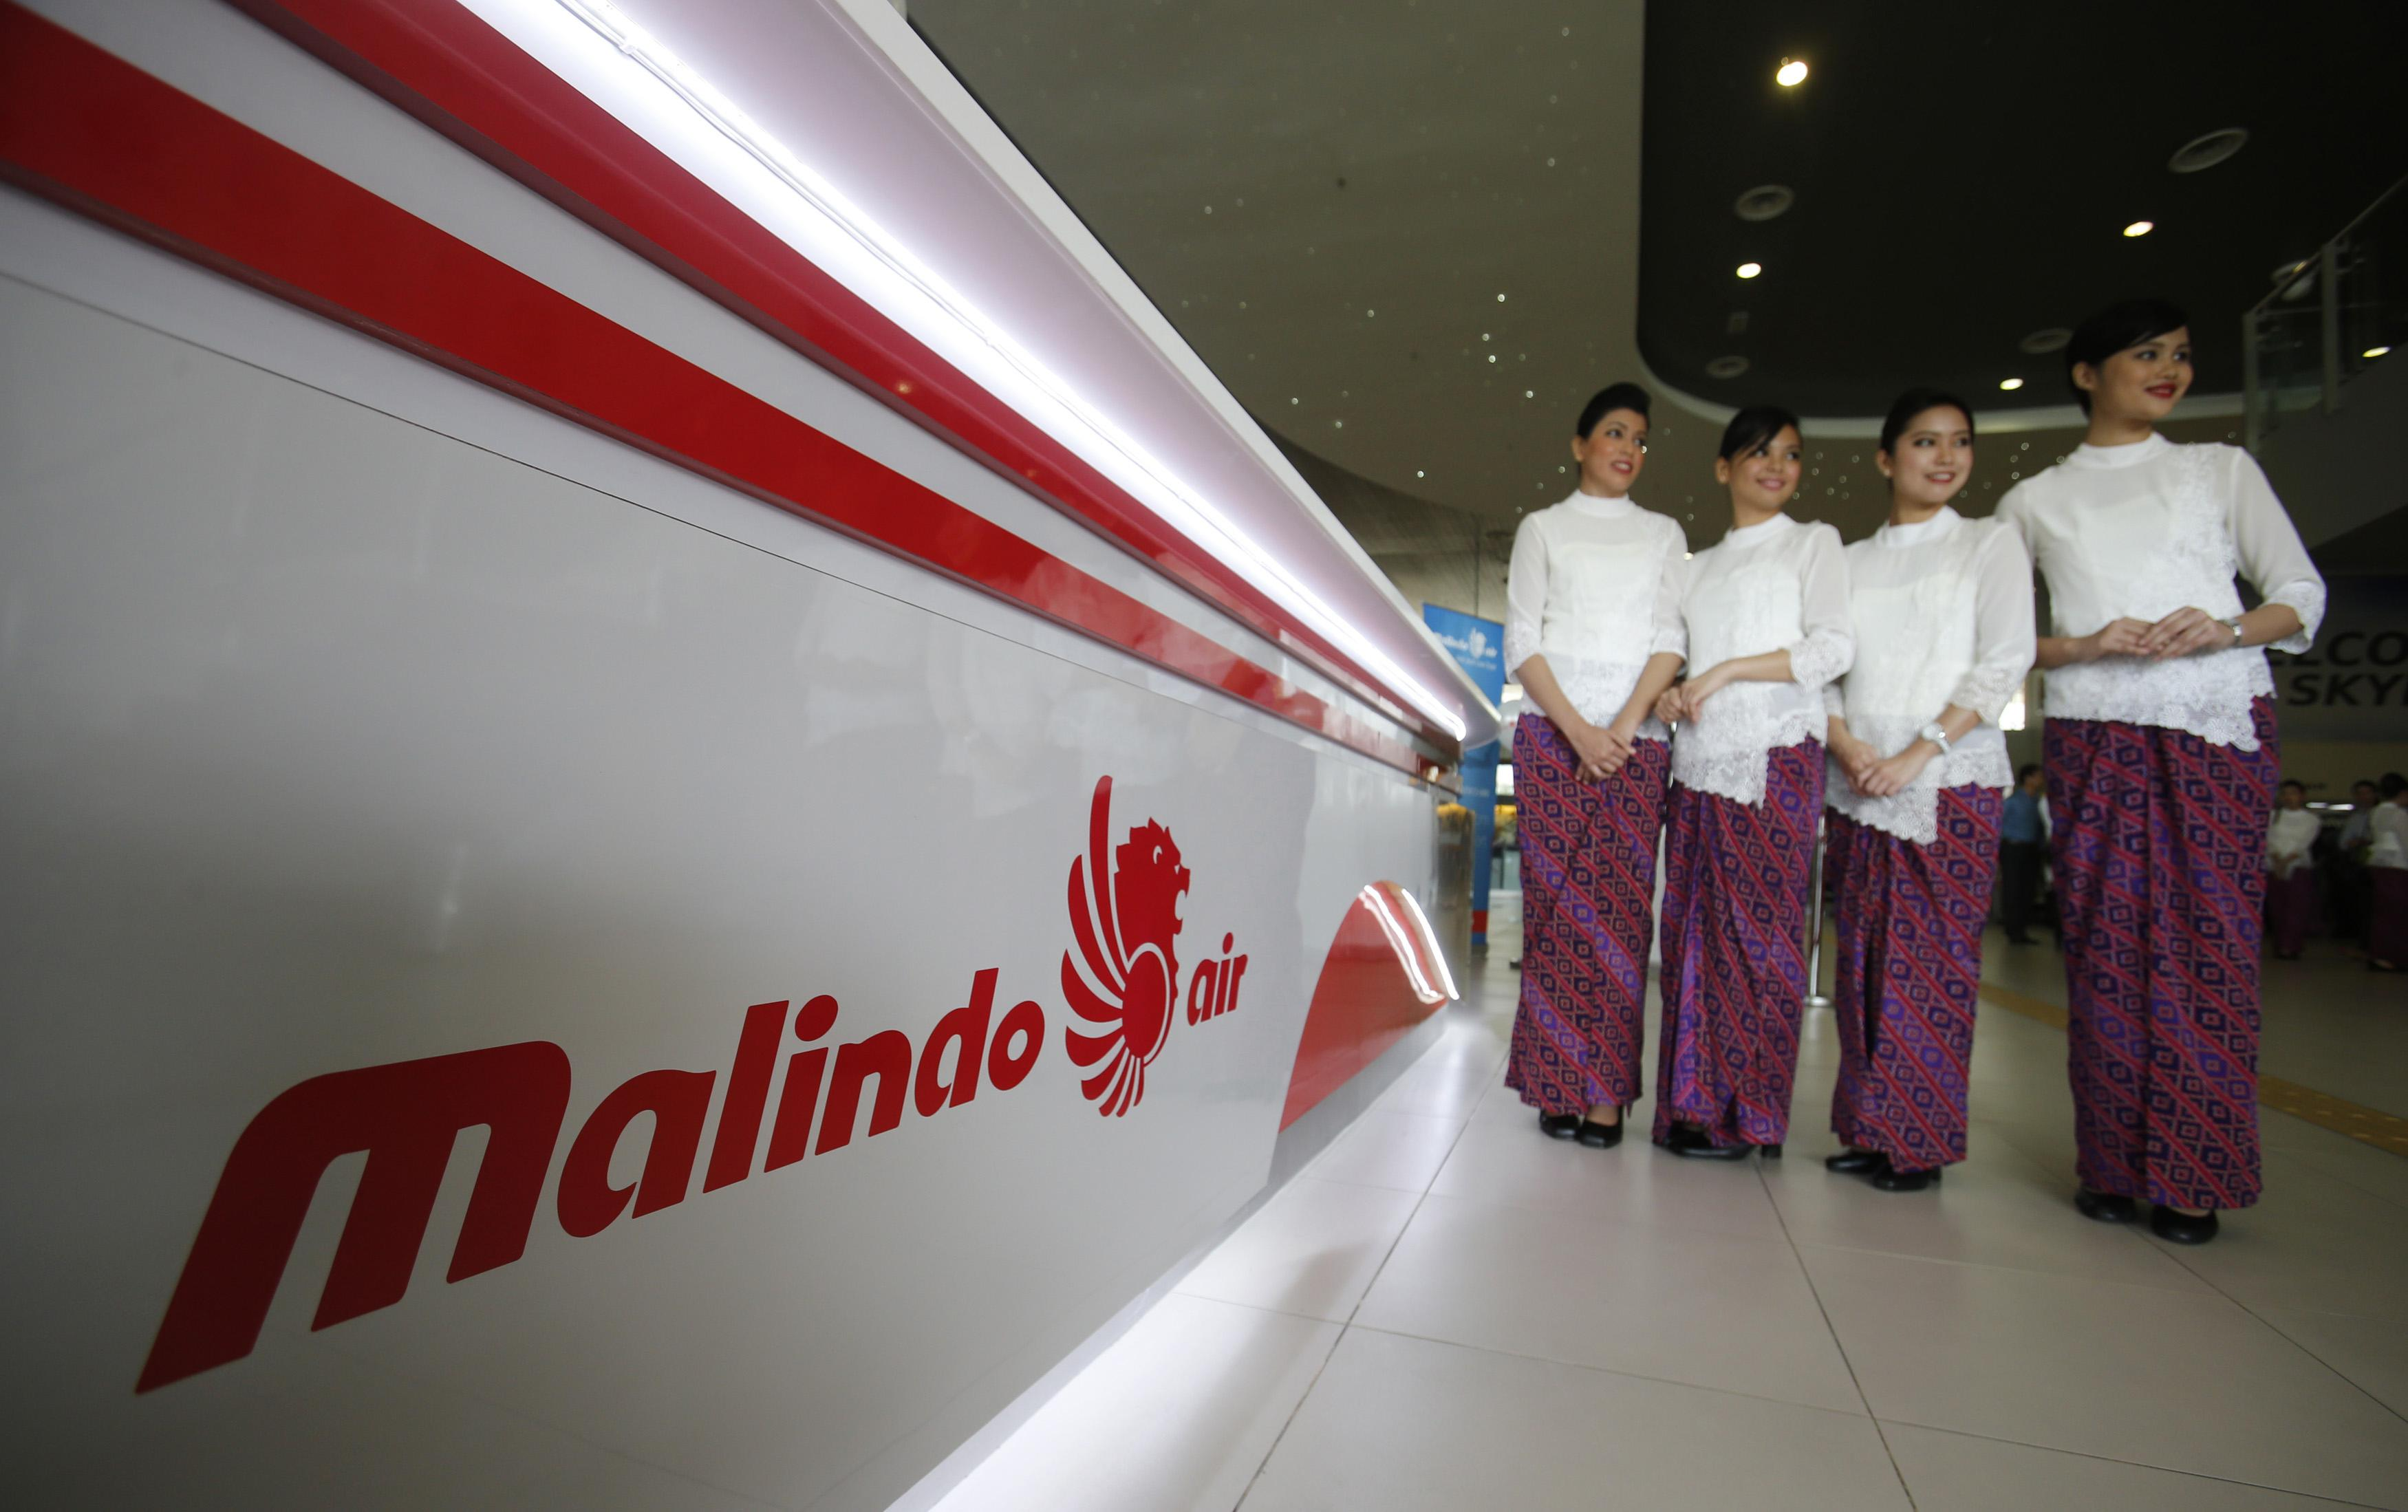 Malaysia's Malindo Air confirms passenger data breach